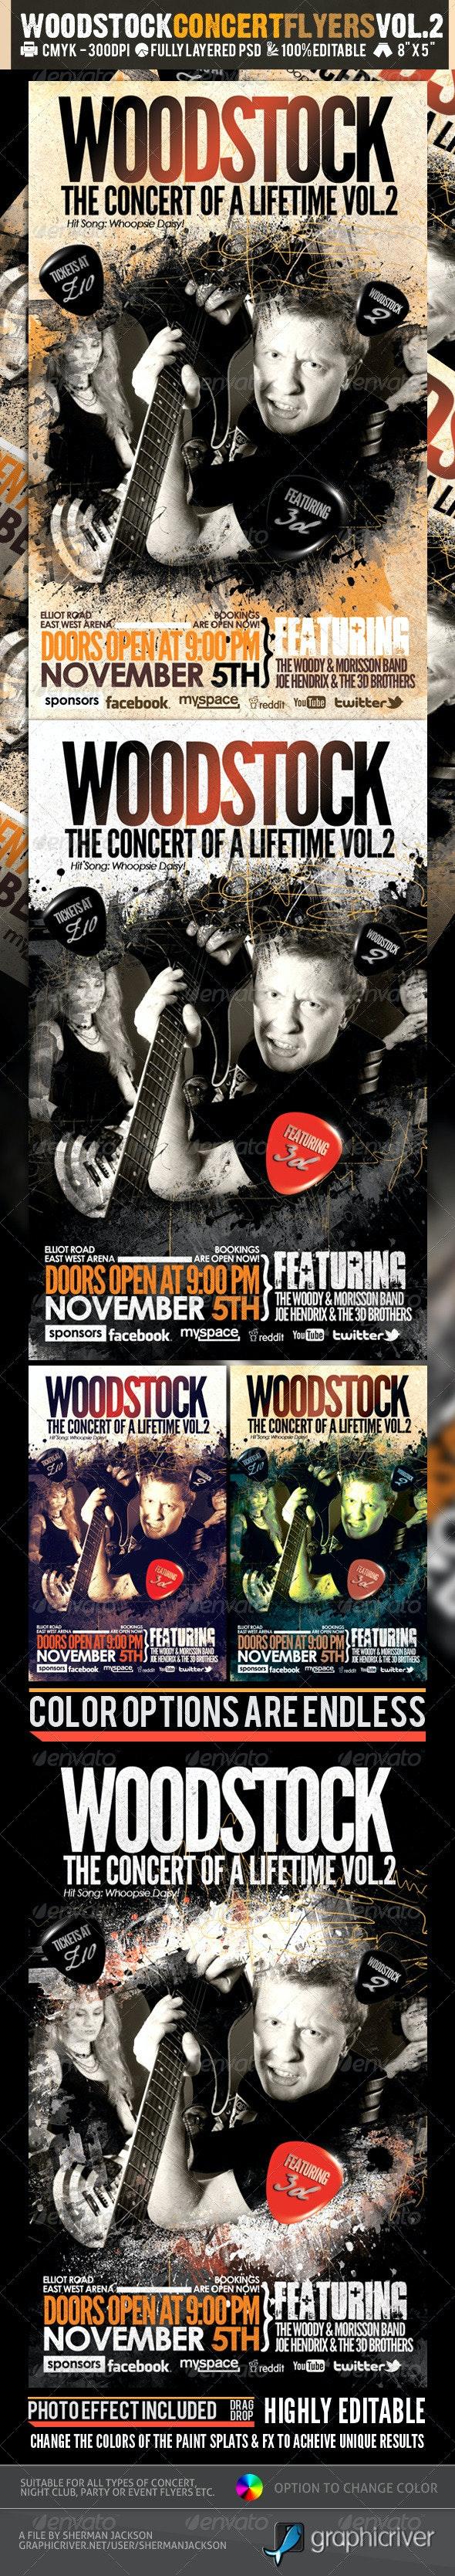 Woodstock PSD Flyer Templates Vol-2 - Concerts Events